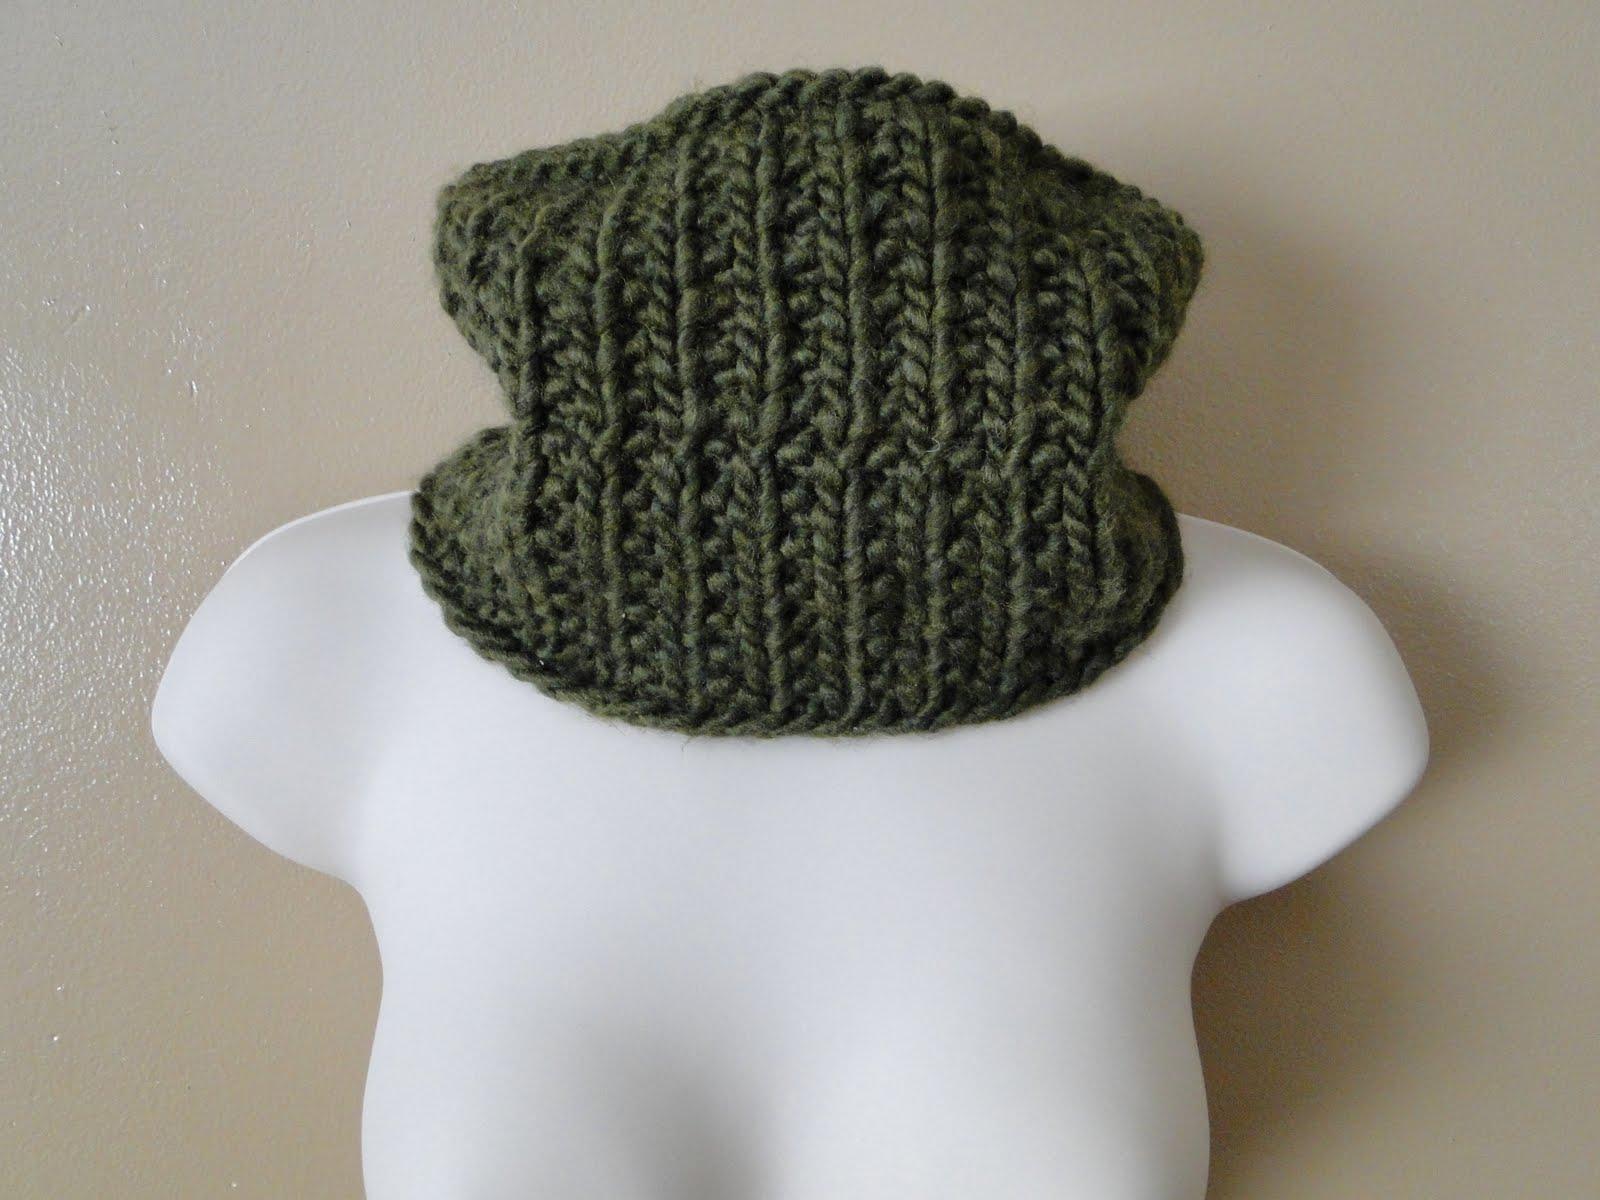 Circular Scarf Knit Pattern : Ruby Knits: Chunky Circular Scarf Pattern